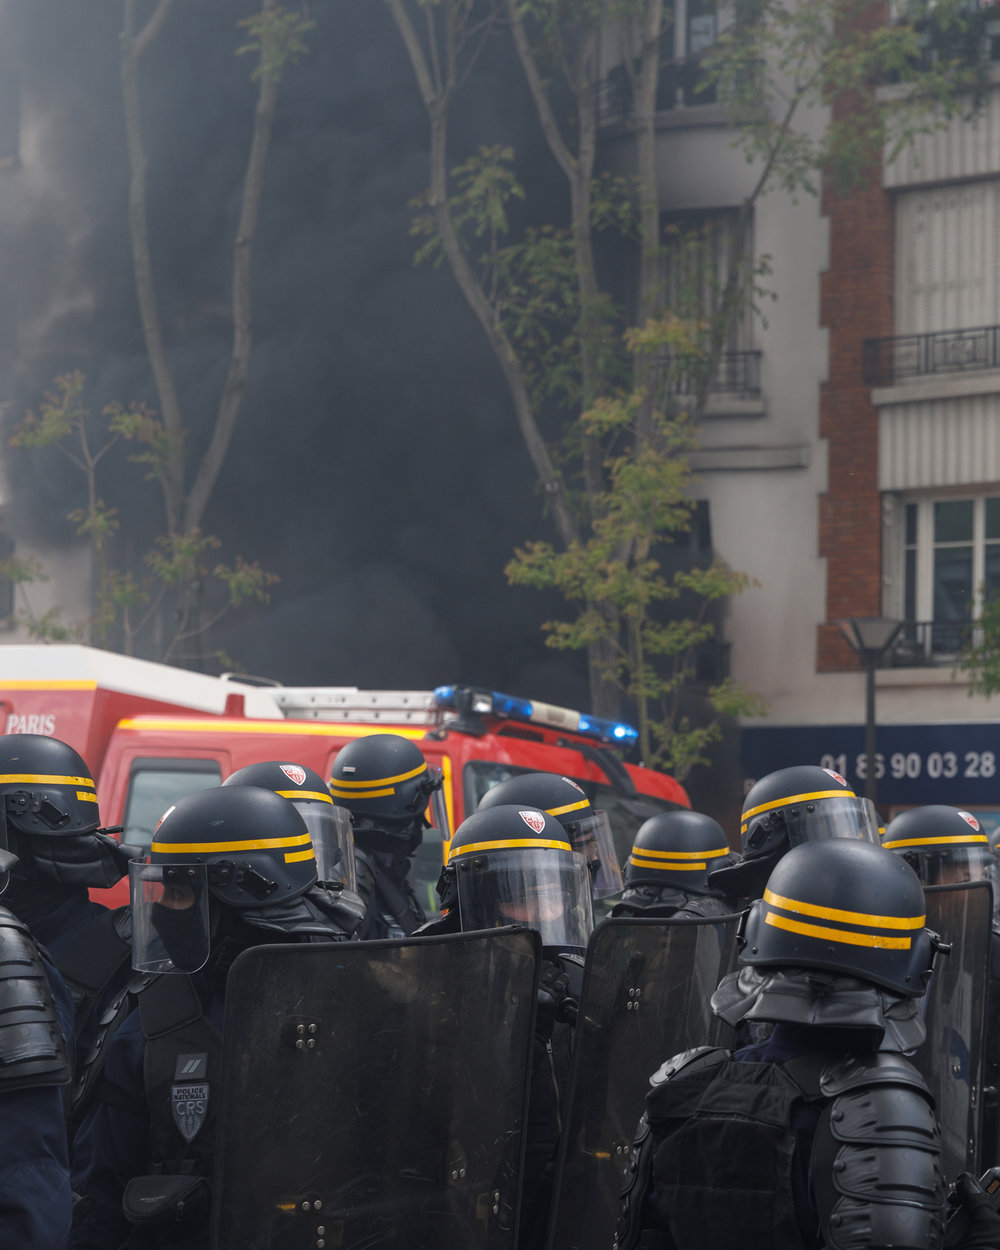 EdRobertson_Occipitals_ParisMayDayRiots_2018_39.jpg